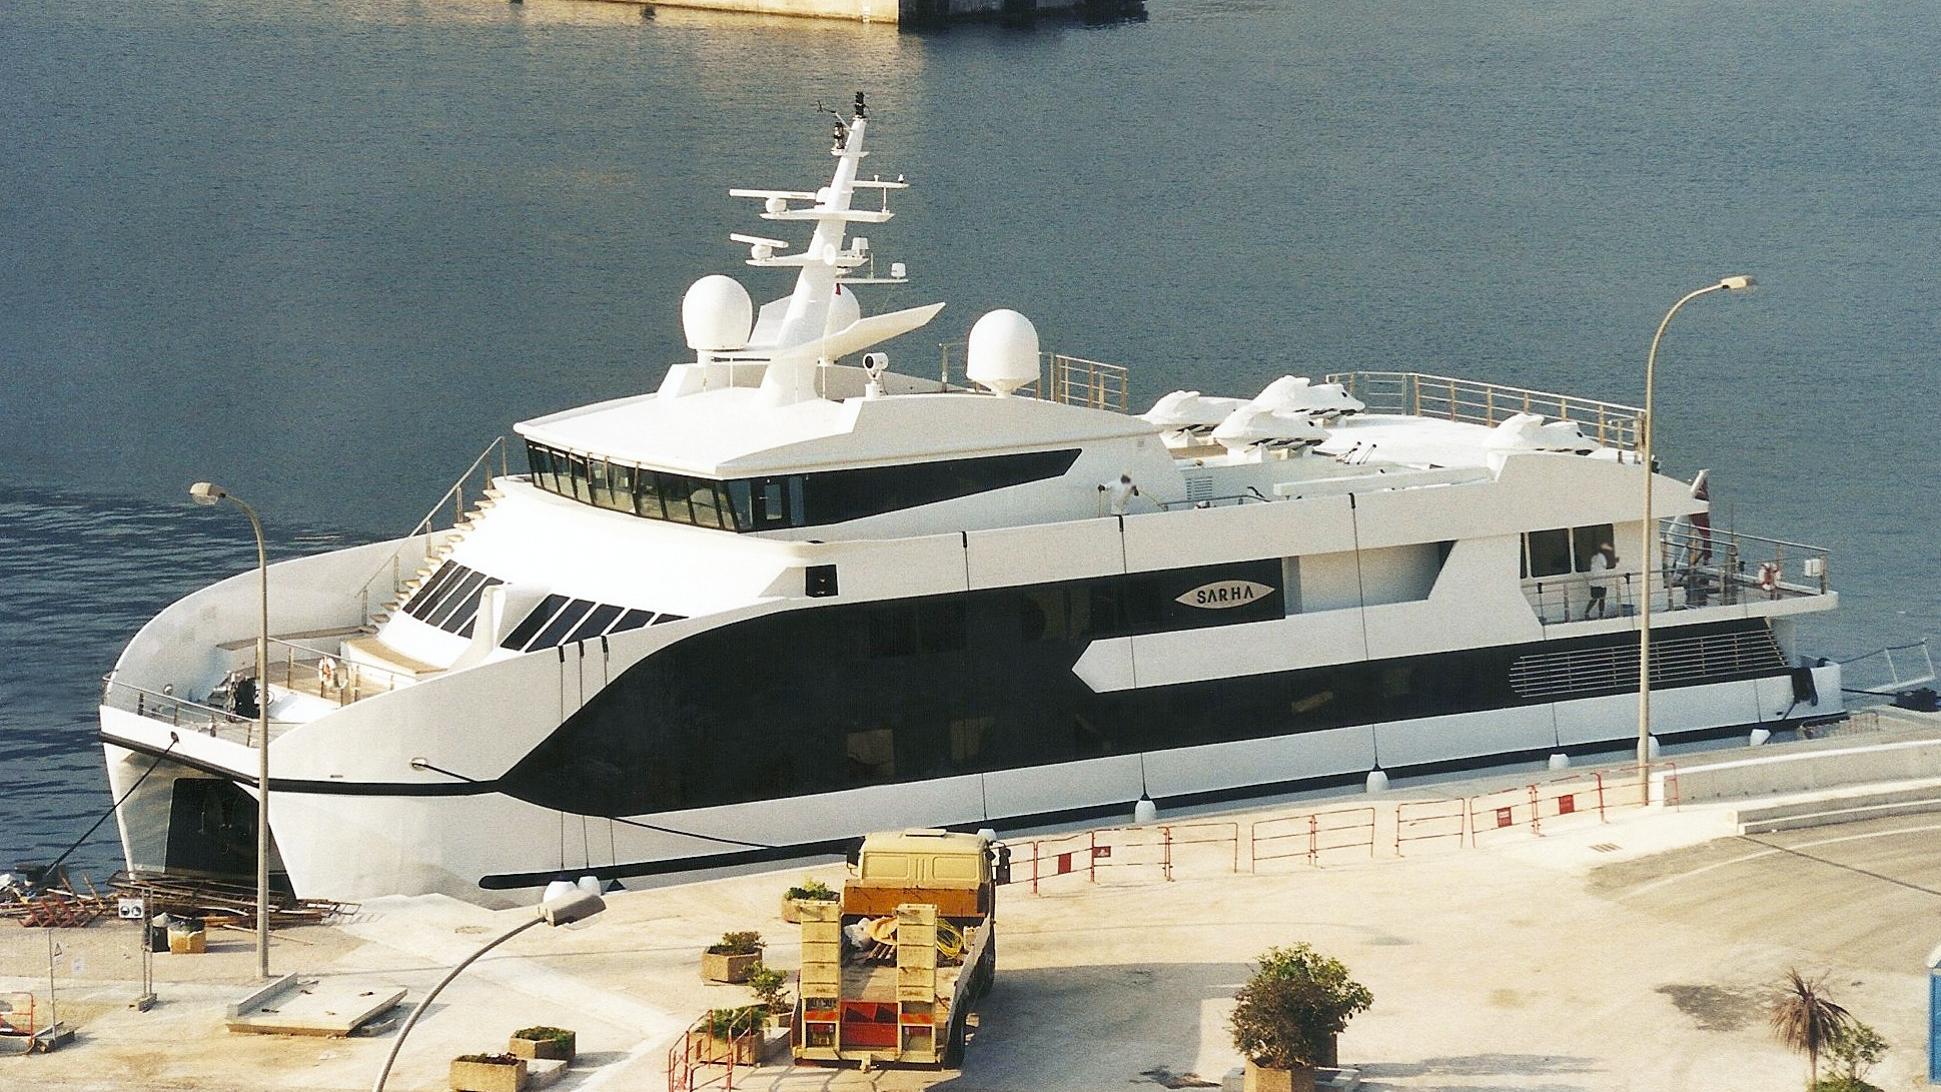 sarha-motor-yacht-asd-1989-40m-profile